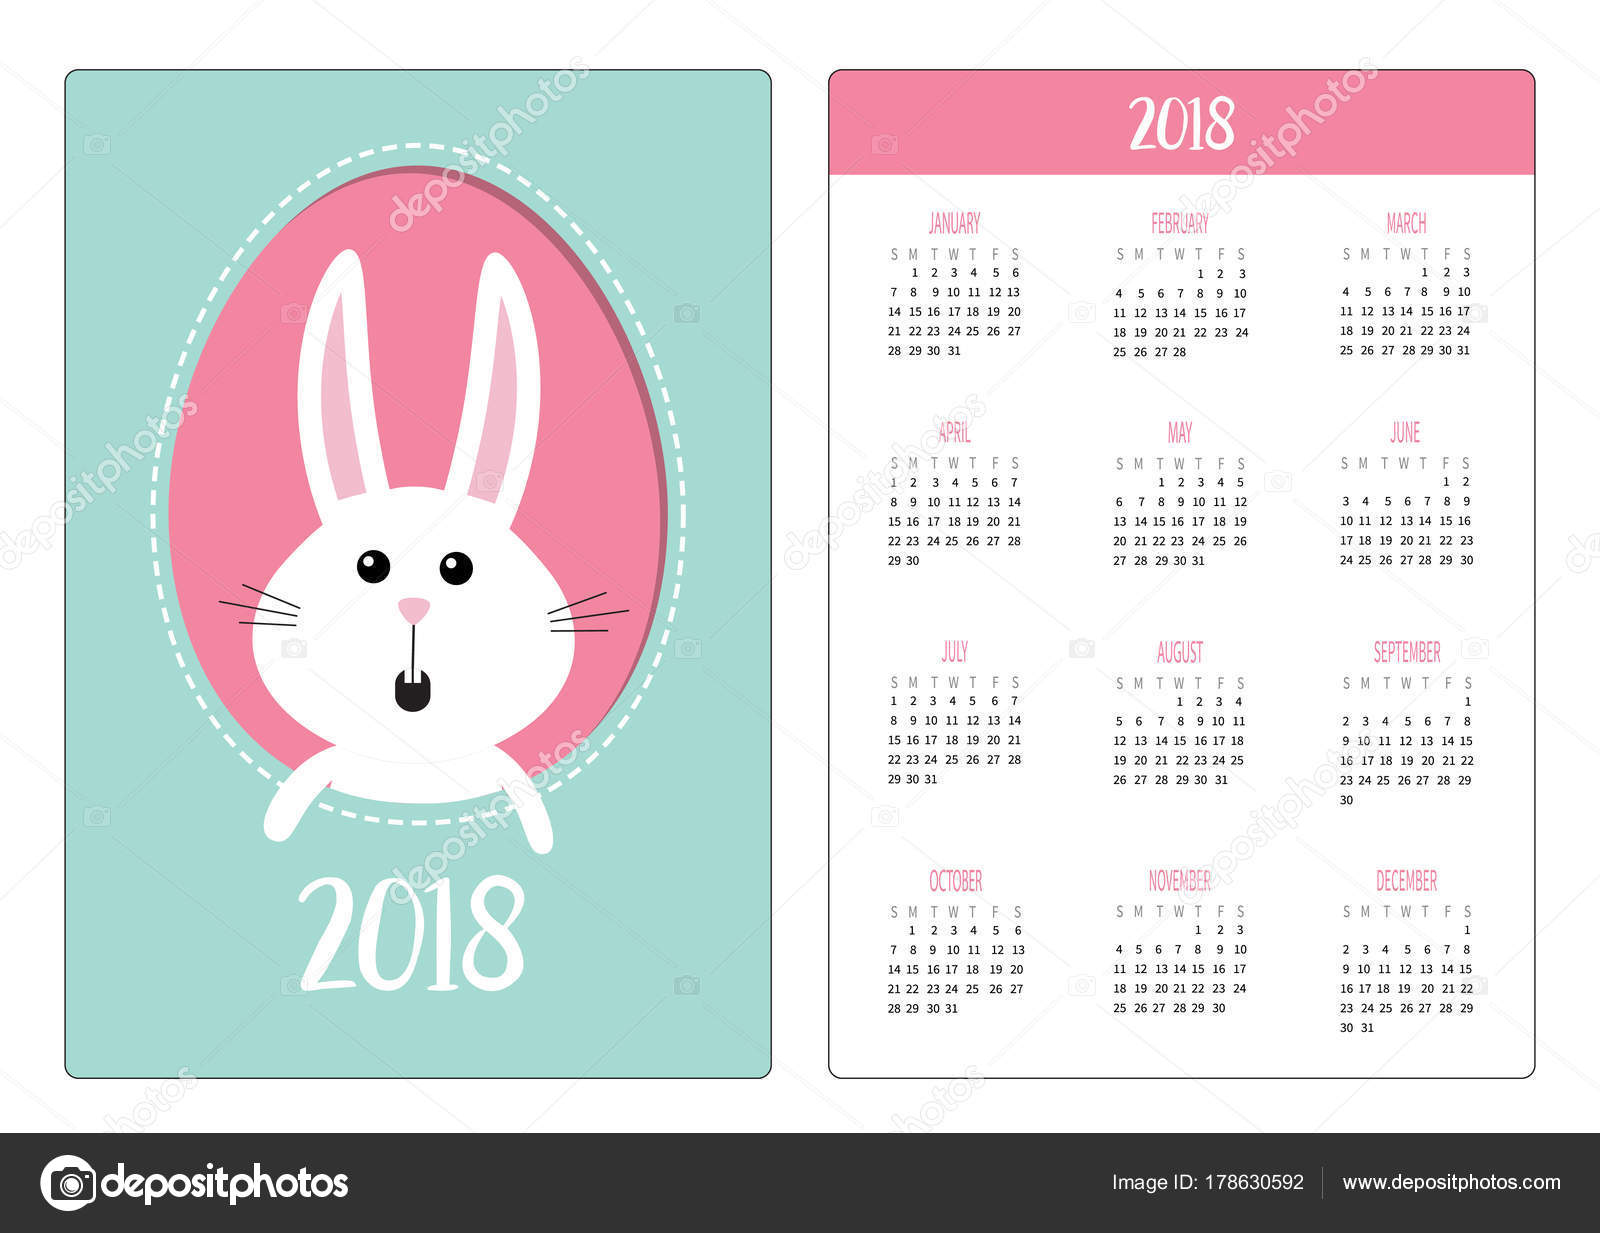 Calendario Bolsillo Año 2018 Semana Comienza Domingo Feliz Pascua ...